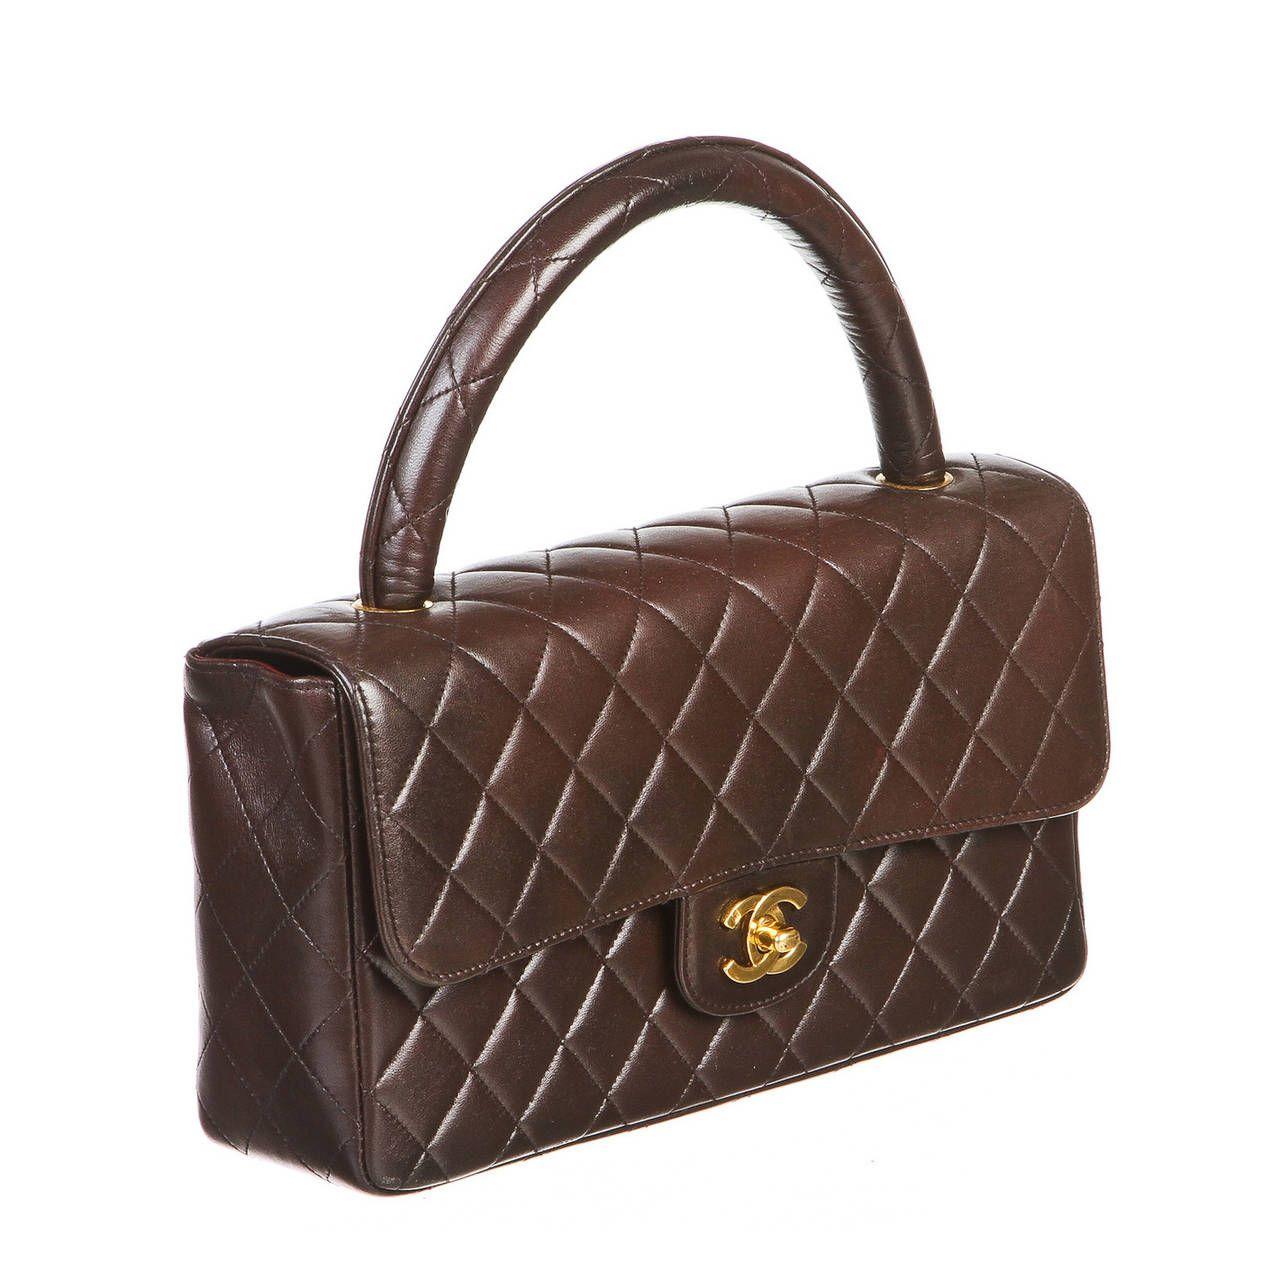 7c4e6effb53c9c Chanel Brown Lambskin Top Handle Handbag | See more vintage Top Handle Bags  at https: